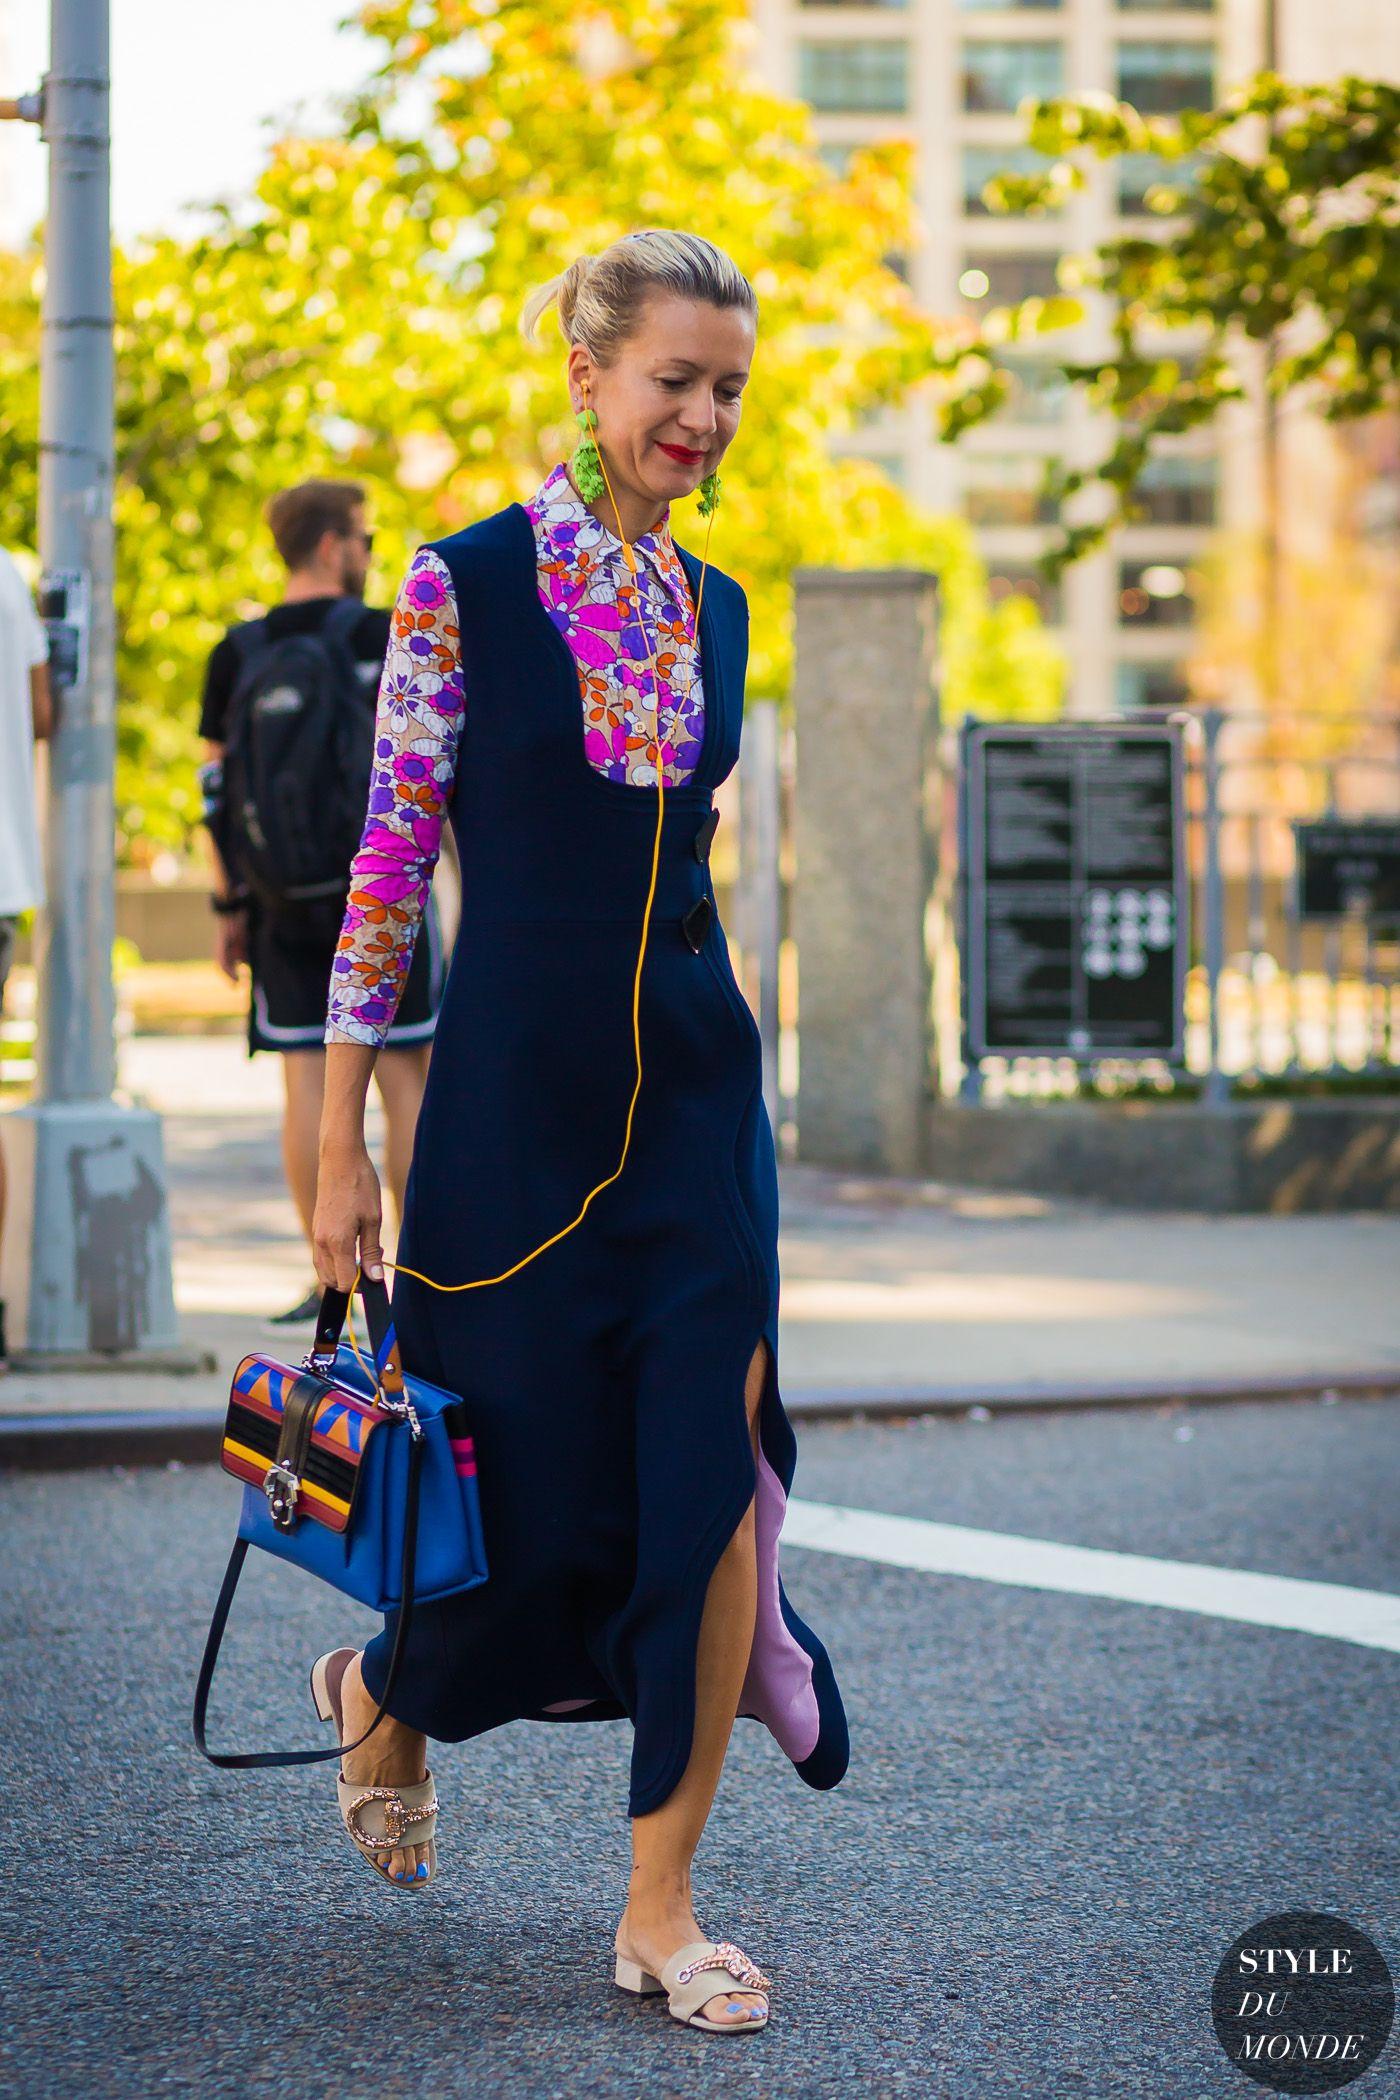 Natalie Joos by STYLEDUMONDE Street Style Fashion Photography